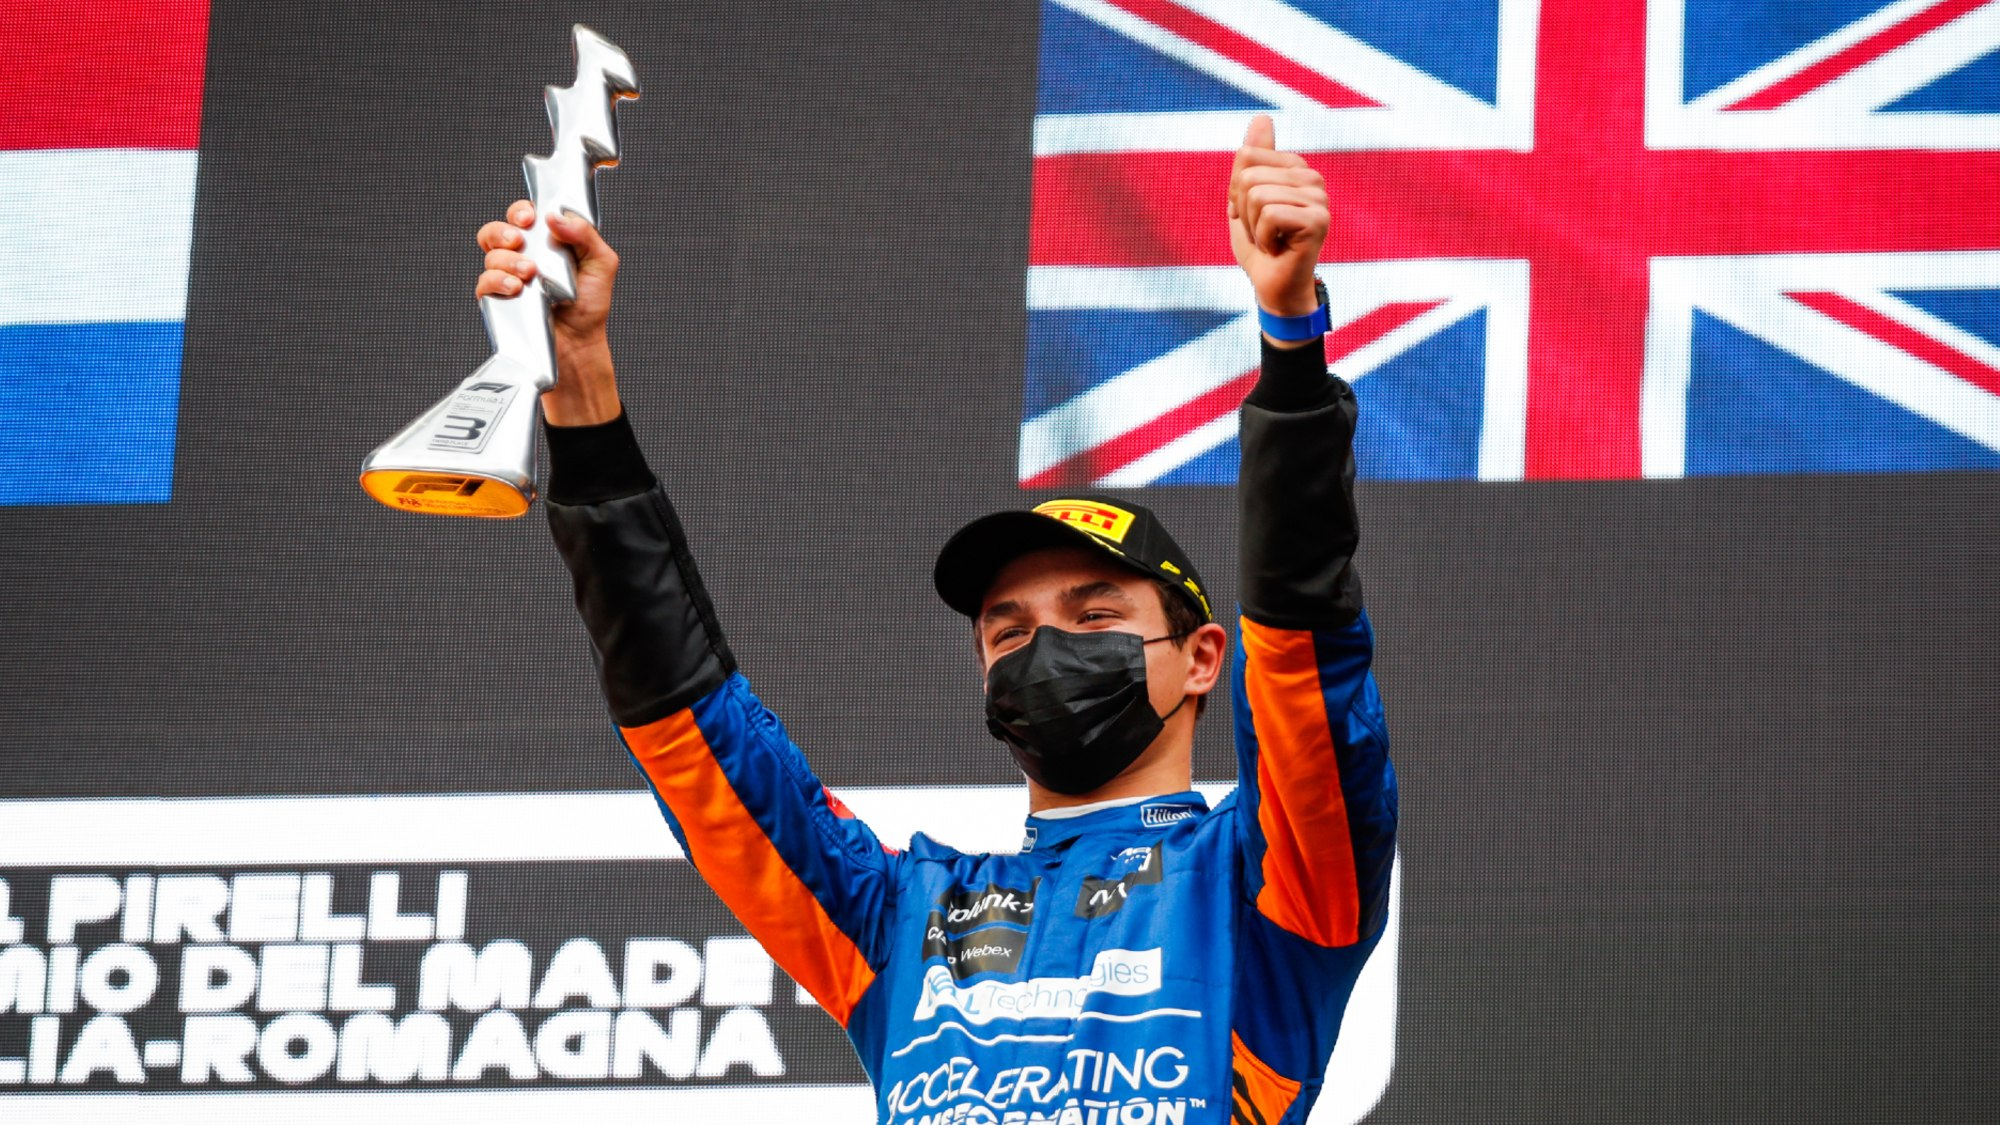 Lando Norris, 2021 Imola GP